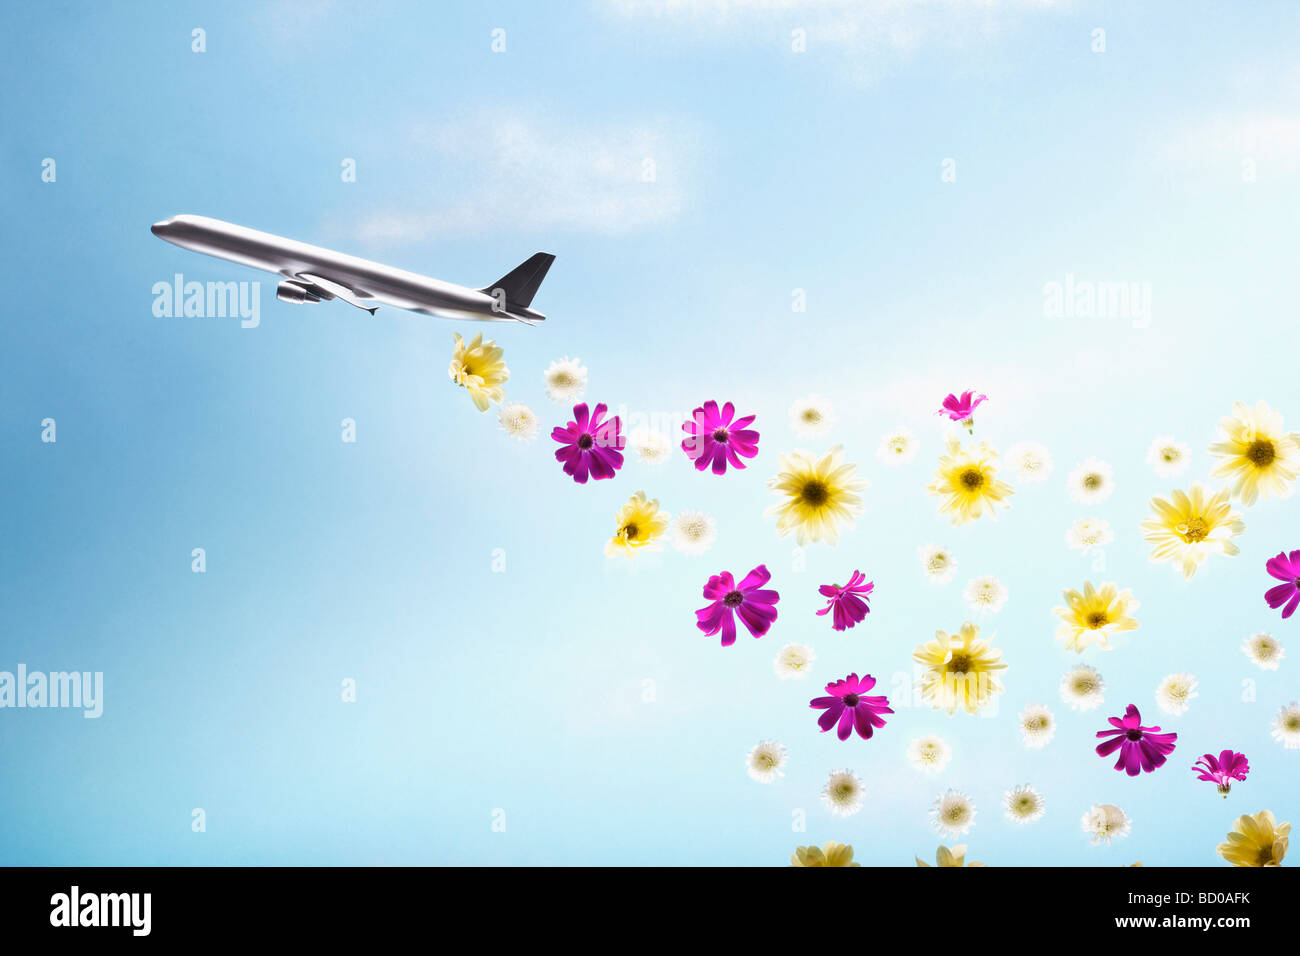 A plane emitting flowers Stock Photo